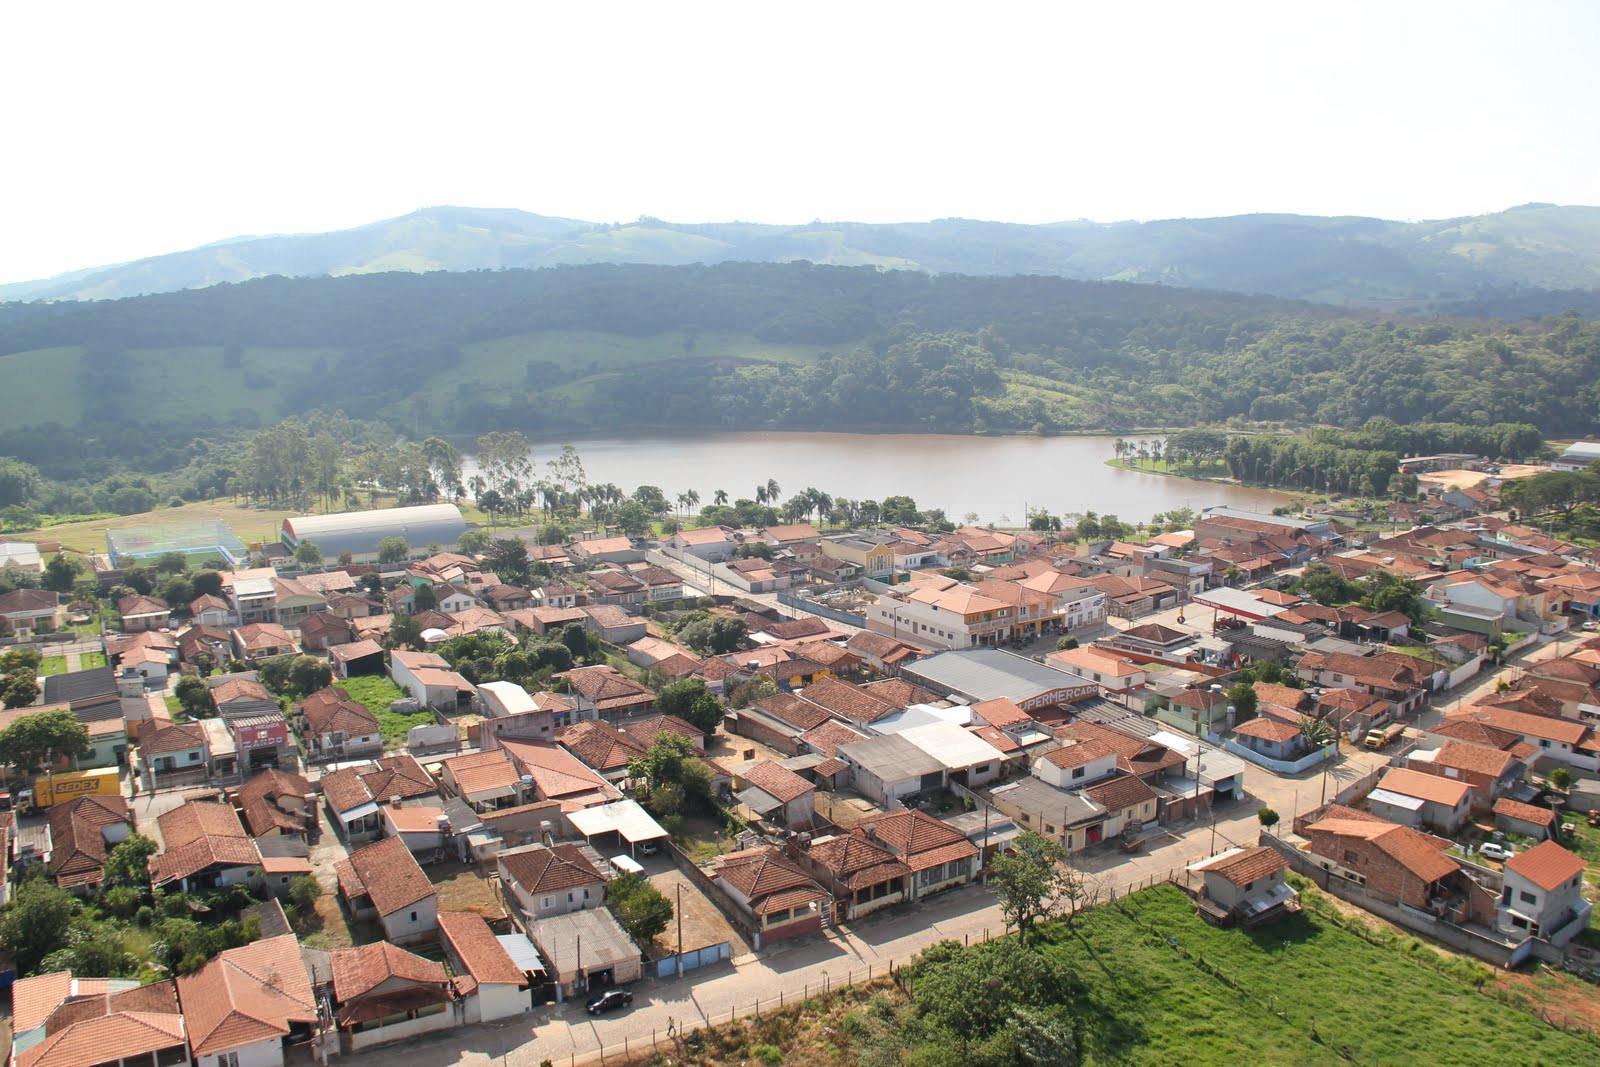 Município de Tuiuti fica localizado a 100 km da capital paulista